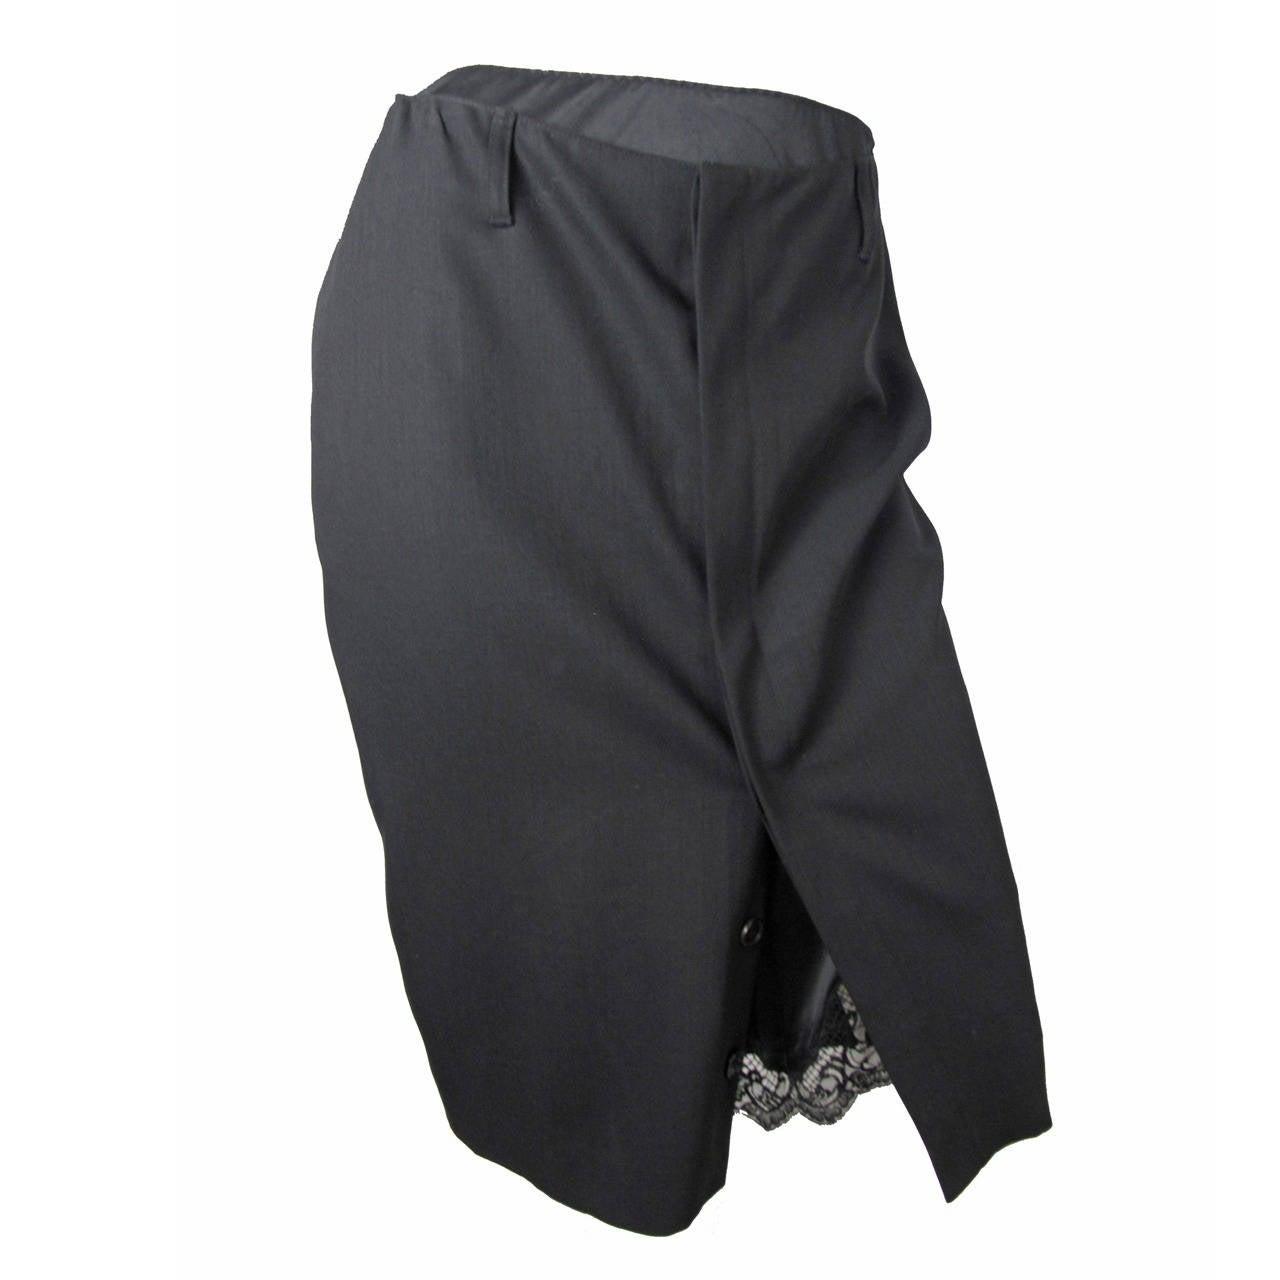 Jean Paul Gaultier black pencil skirt, lace slip 1